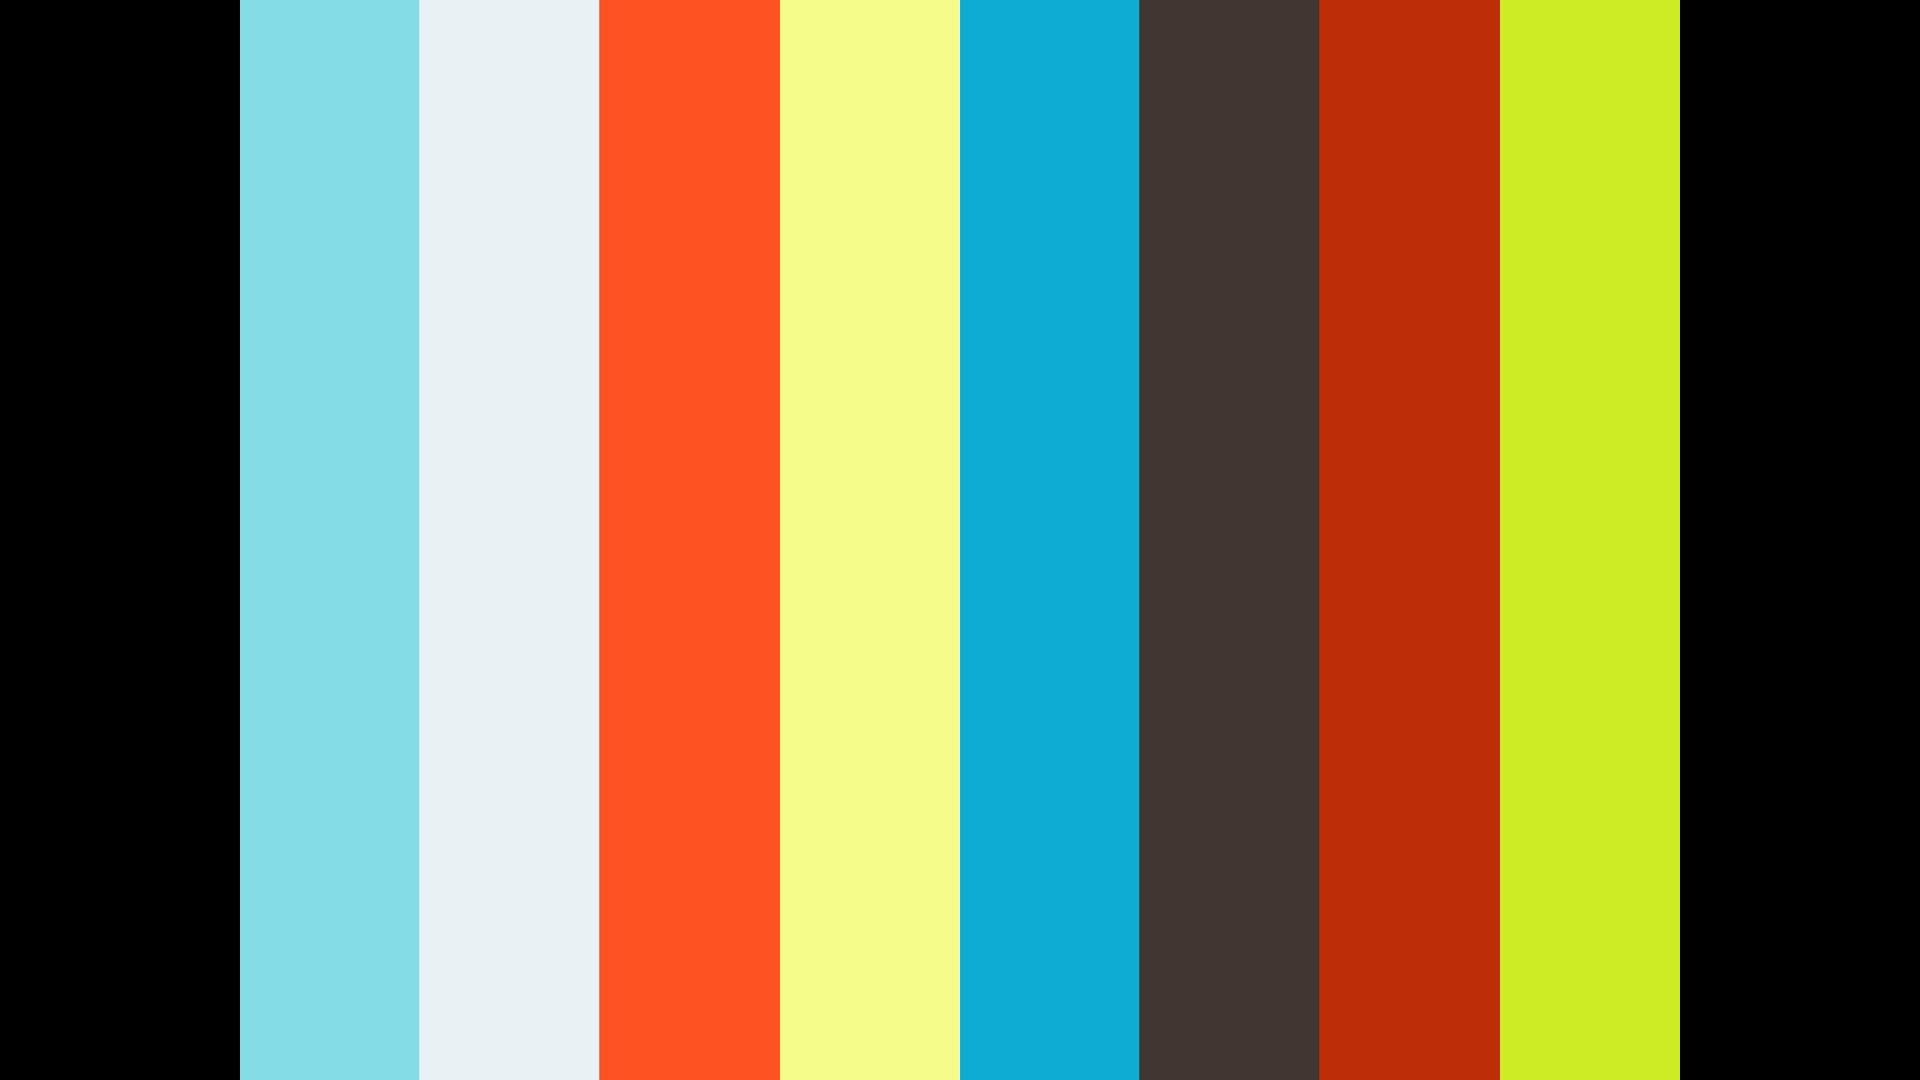 2021-01-18 LIFOU PENG - SKYVIEW